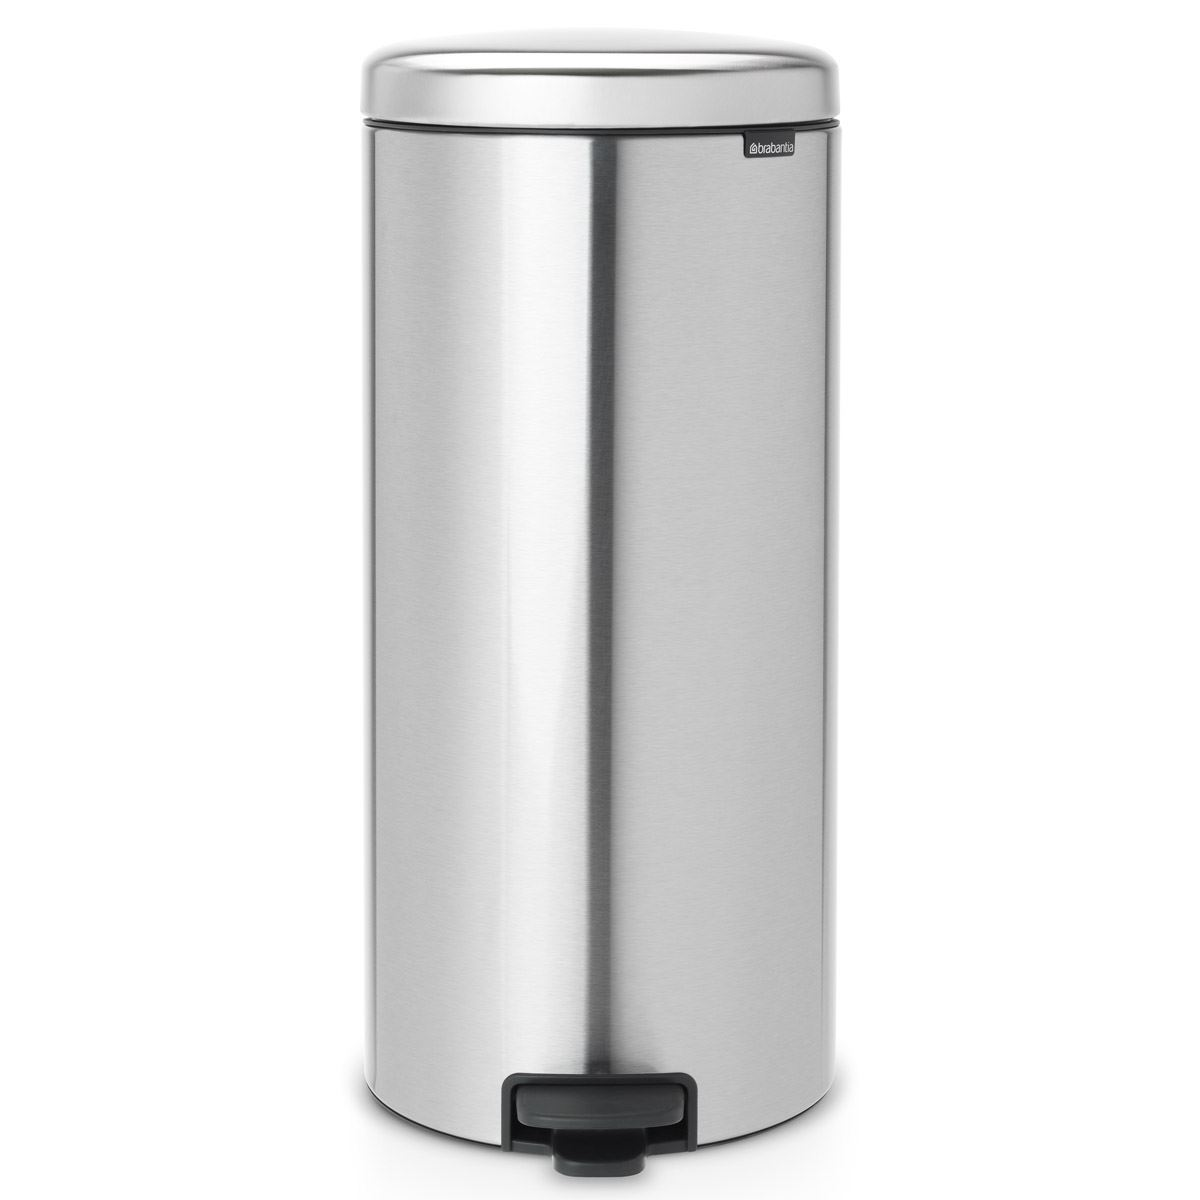 Brabantia newIcon Pedal Bin 30 Litre Plastic Bucket Matt Steel Fingerprint Proof